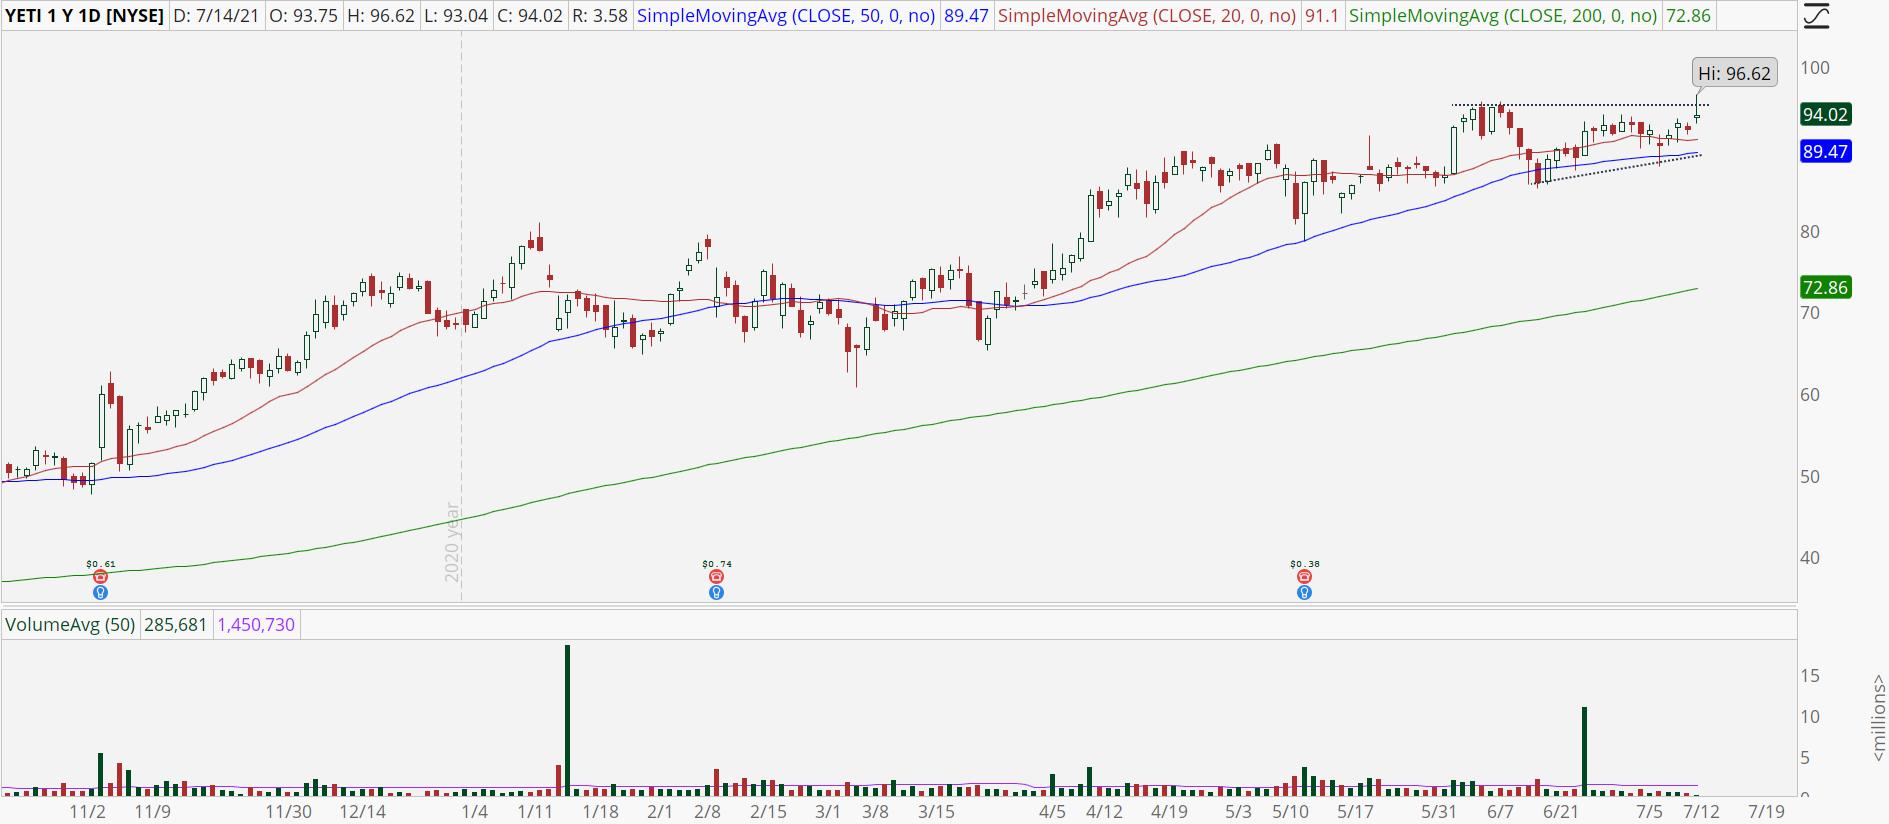 Yeti (YETI) stock chart with bullish breakout